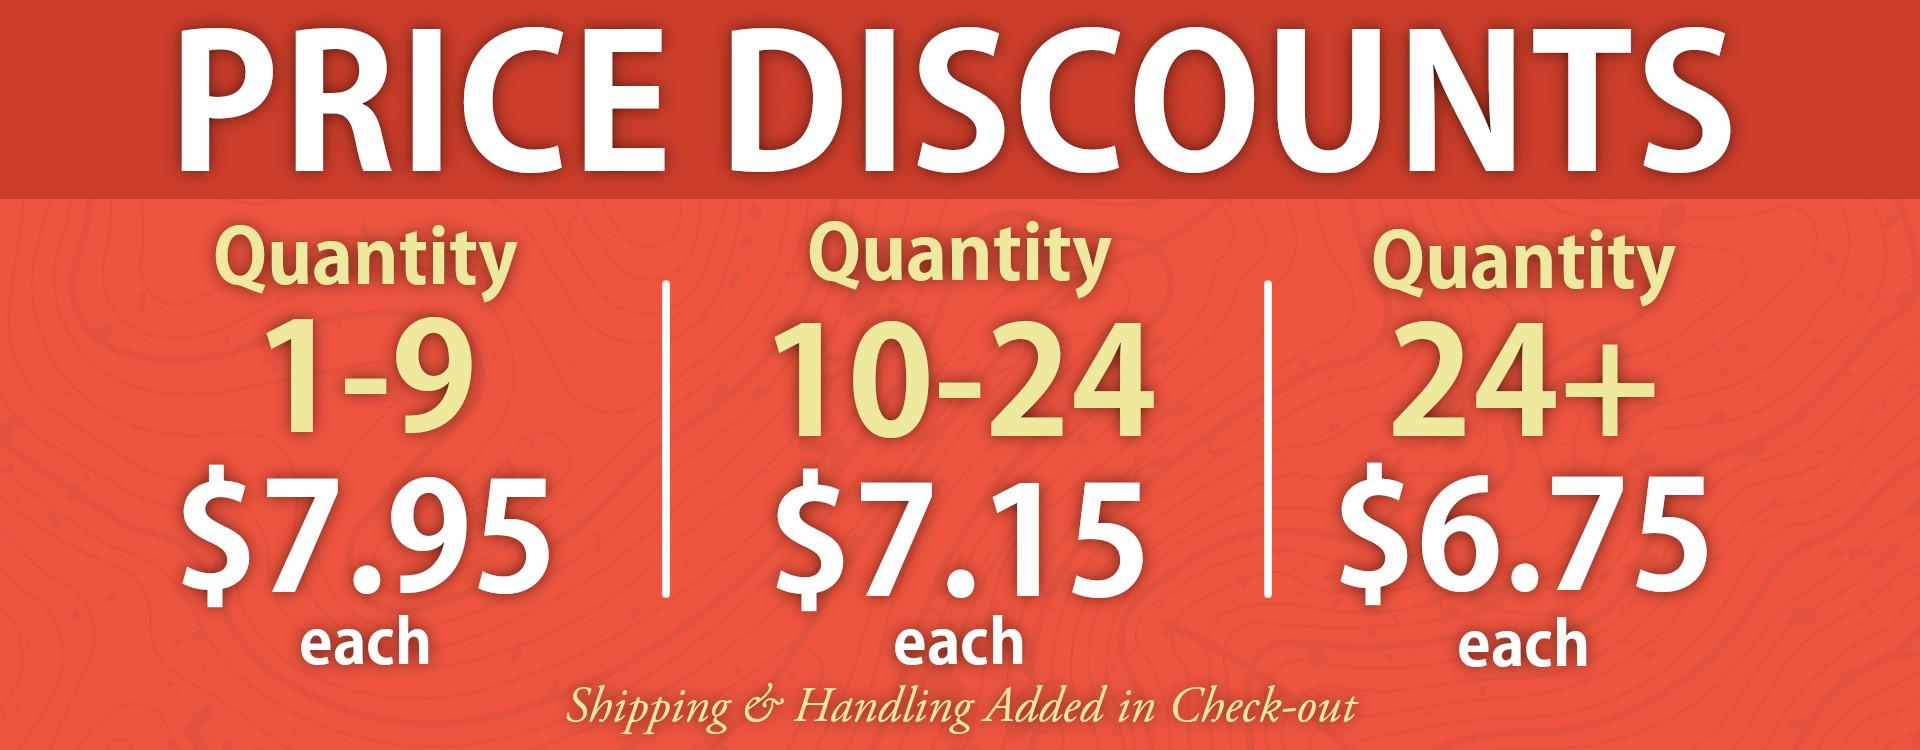 bulk-discounts-thin.jpg